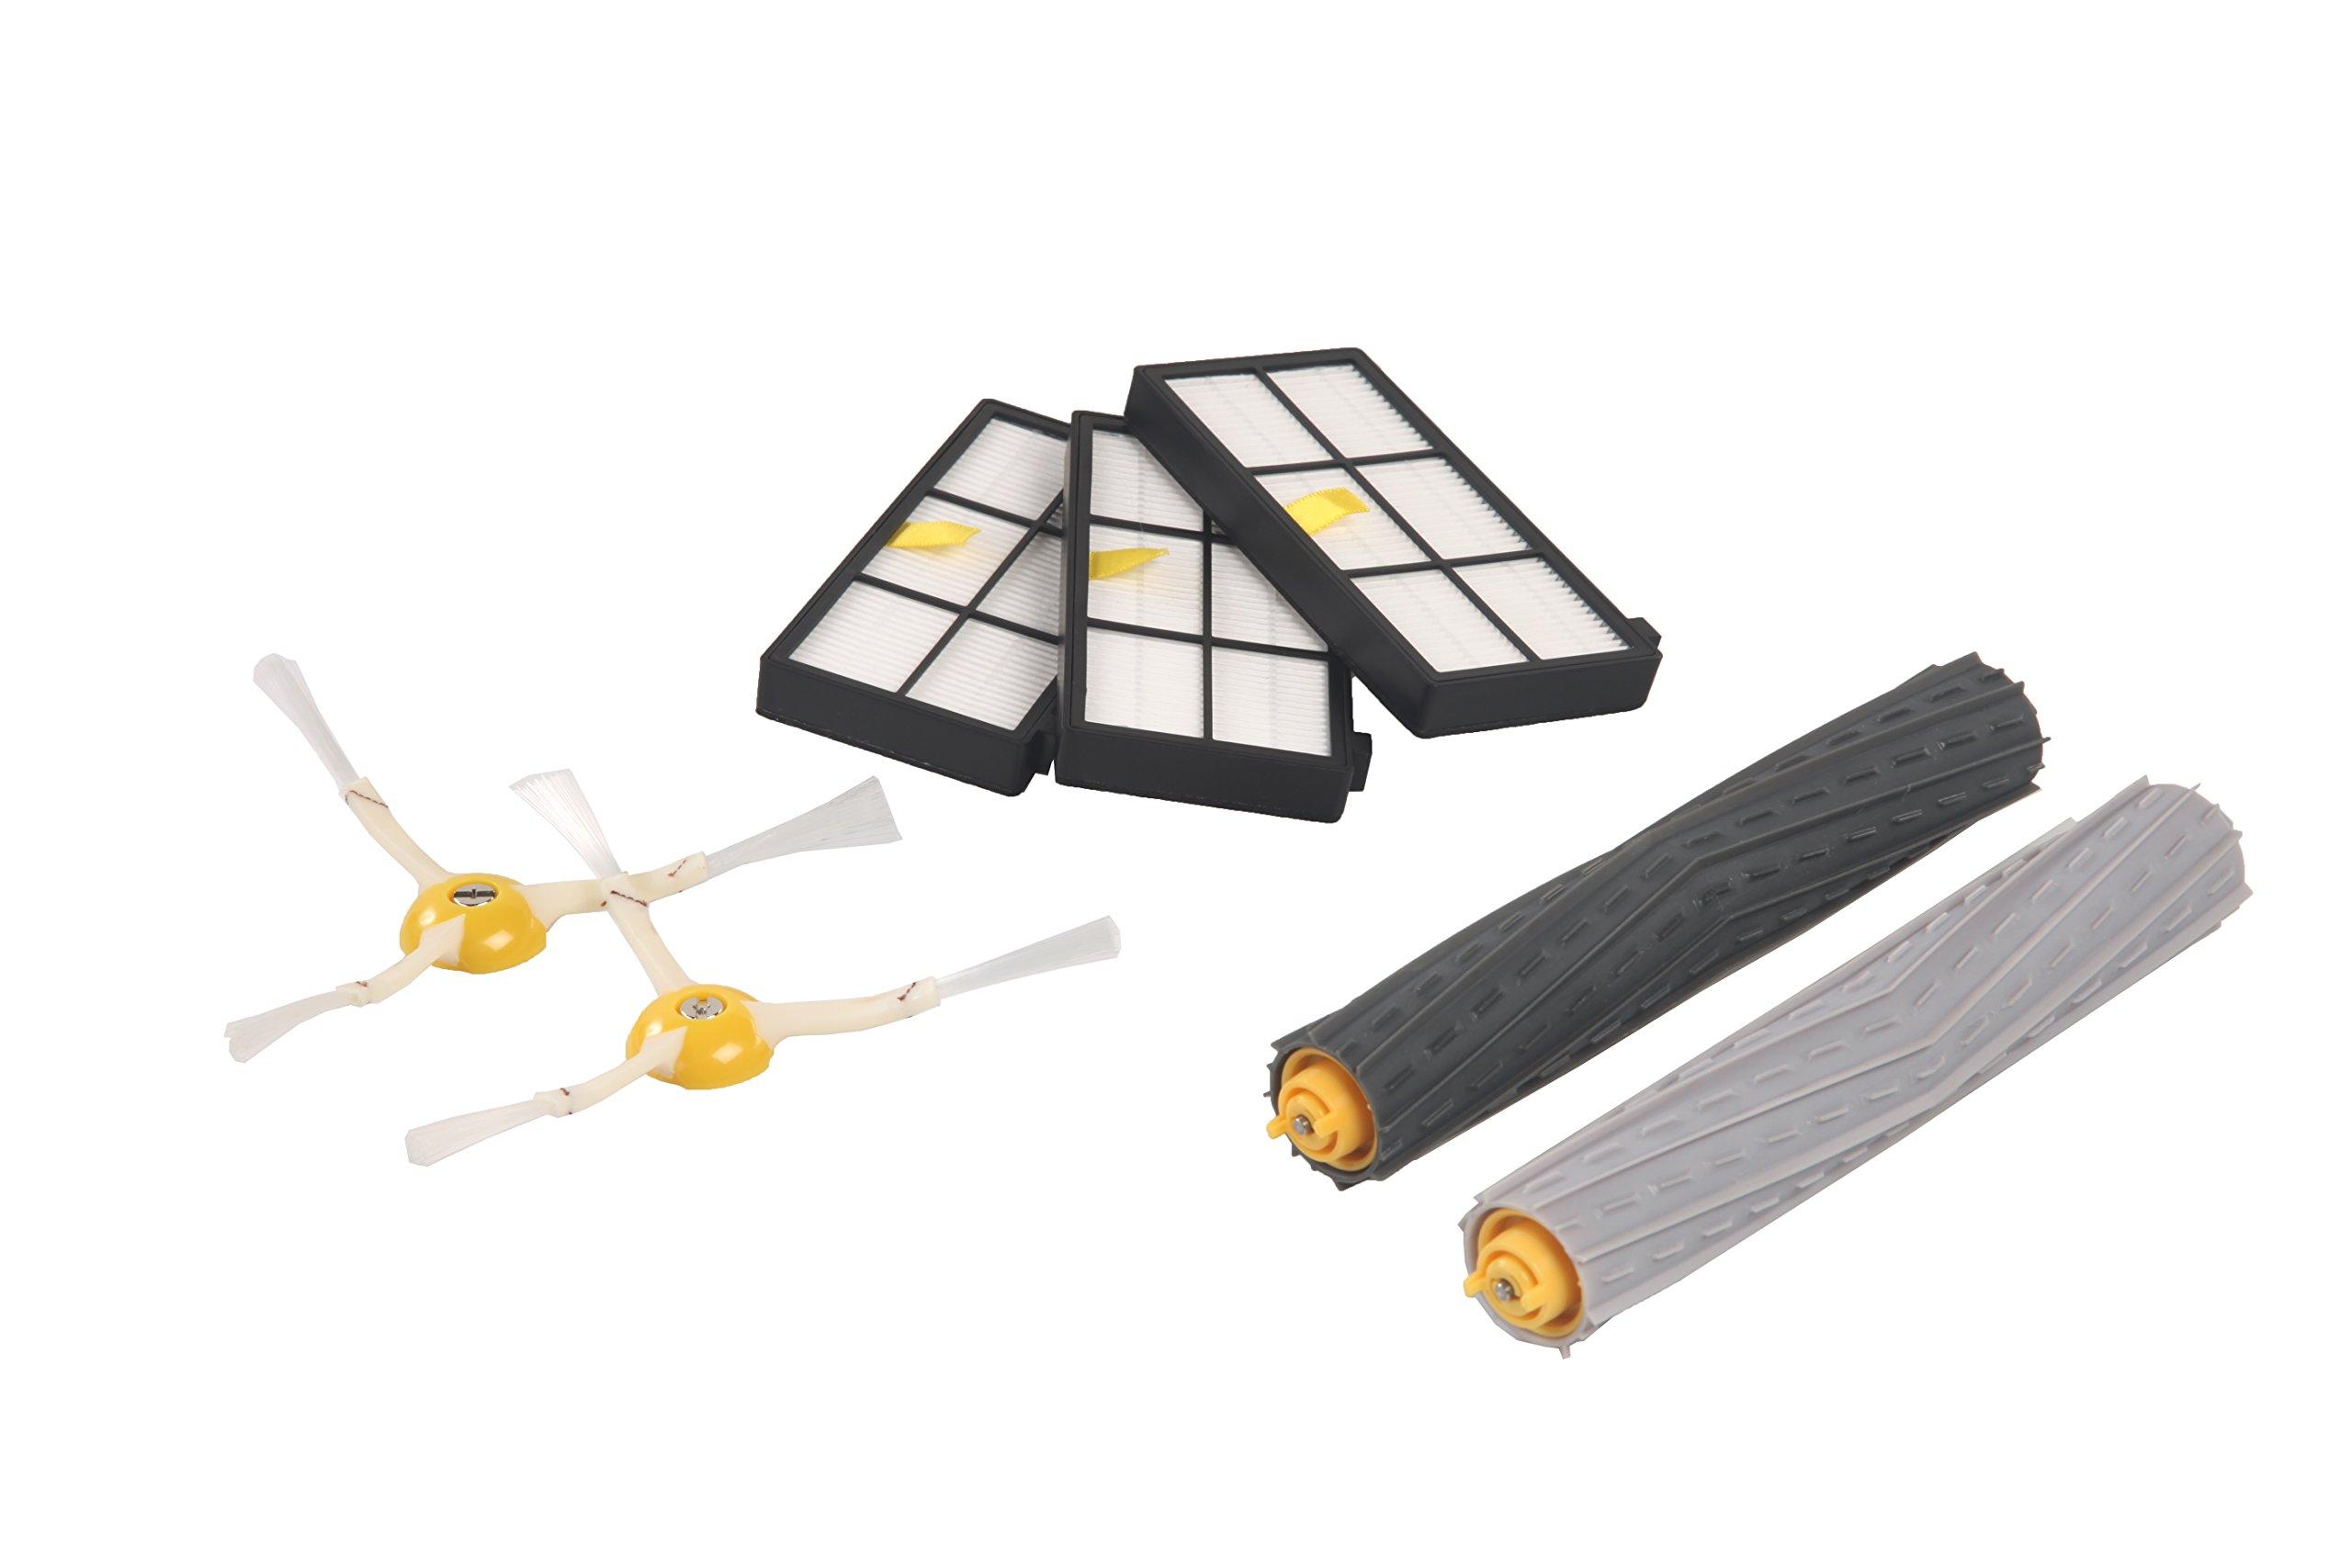 Authentic iRobot Parts - Roomba 800 & 900 Series Replenishment Kit by iRobot